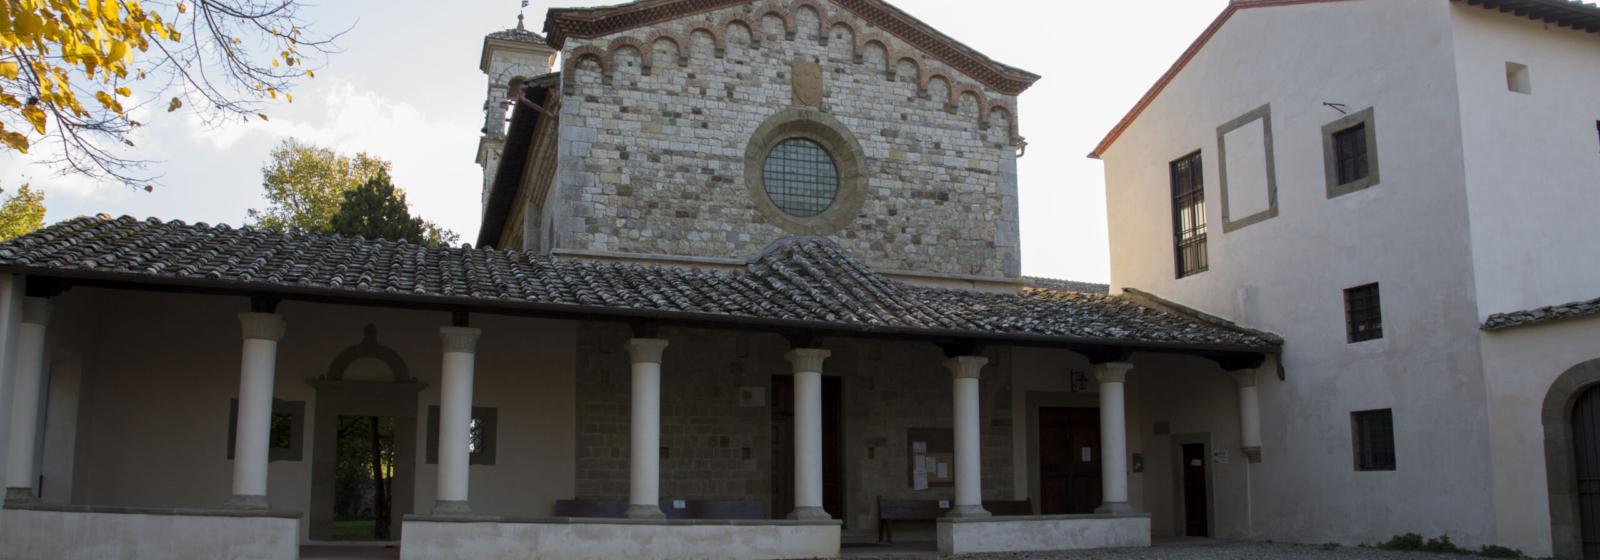 S. Bonaventura - Bosco ai Frati 2